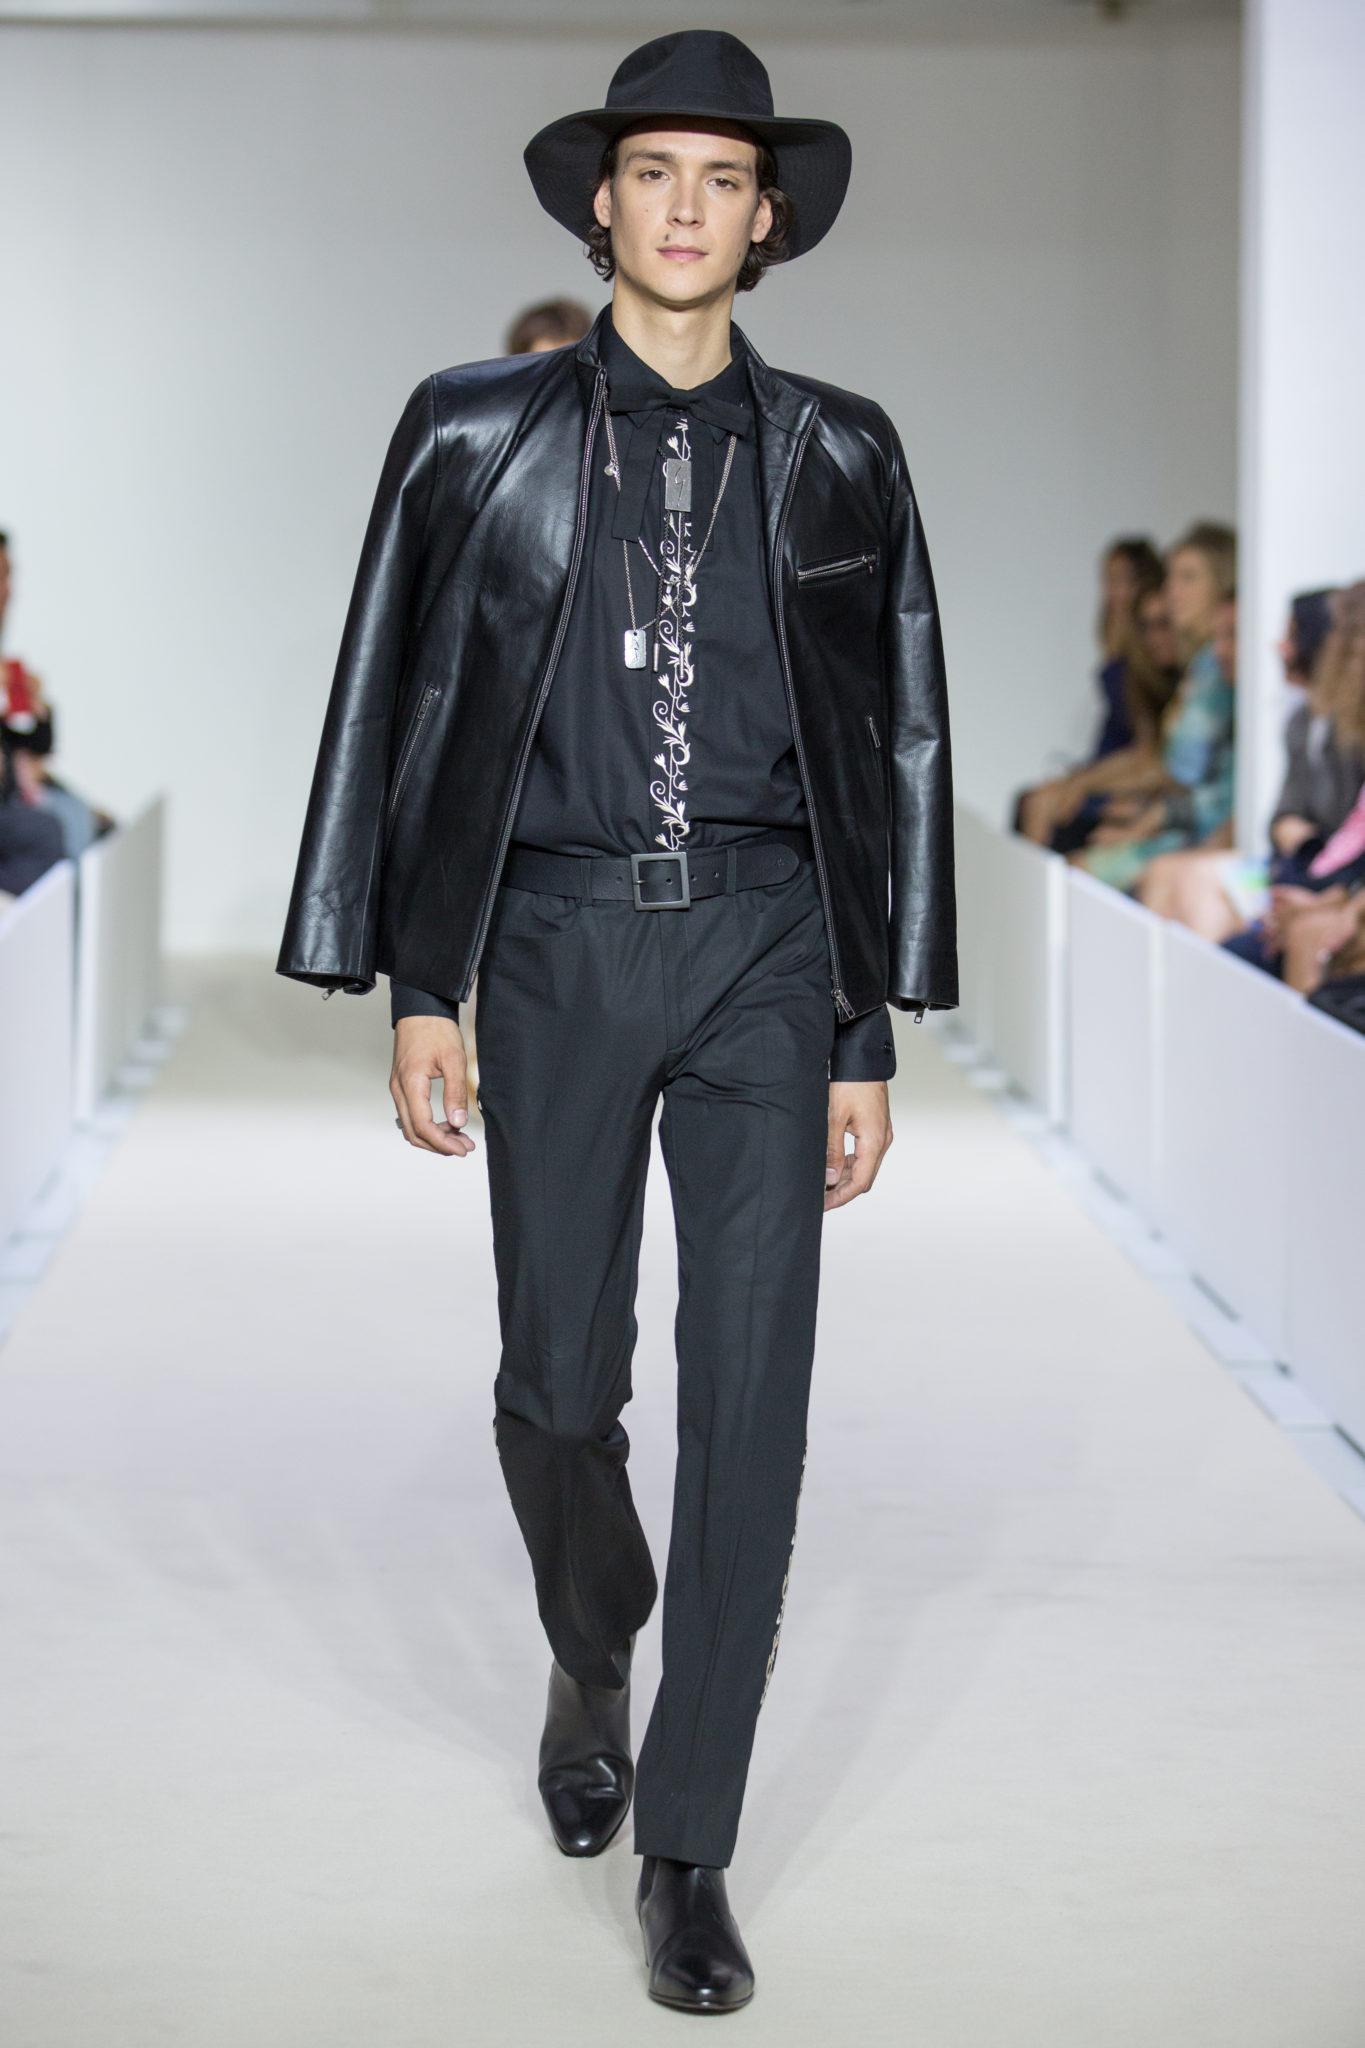 52b351fe84e50 blog-mode-homme-strasbourg-paris-fashion-week-pfw-men-2017-agnesb-defile -lifestyle-fashionblogger-french-blogueur-mode-influenceur-6